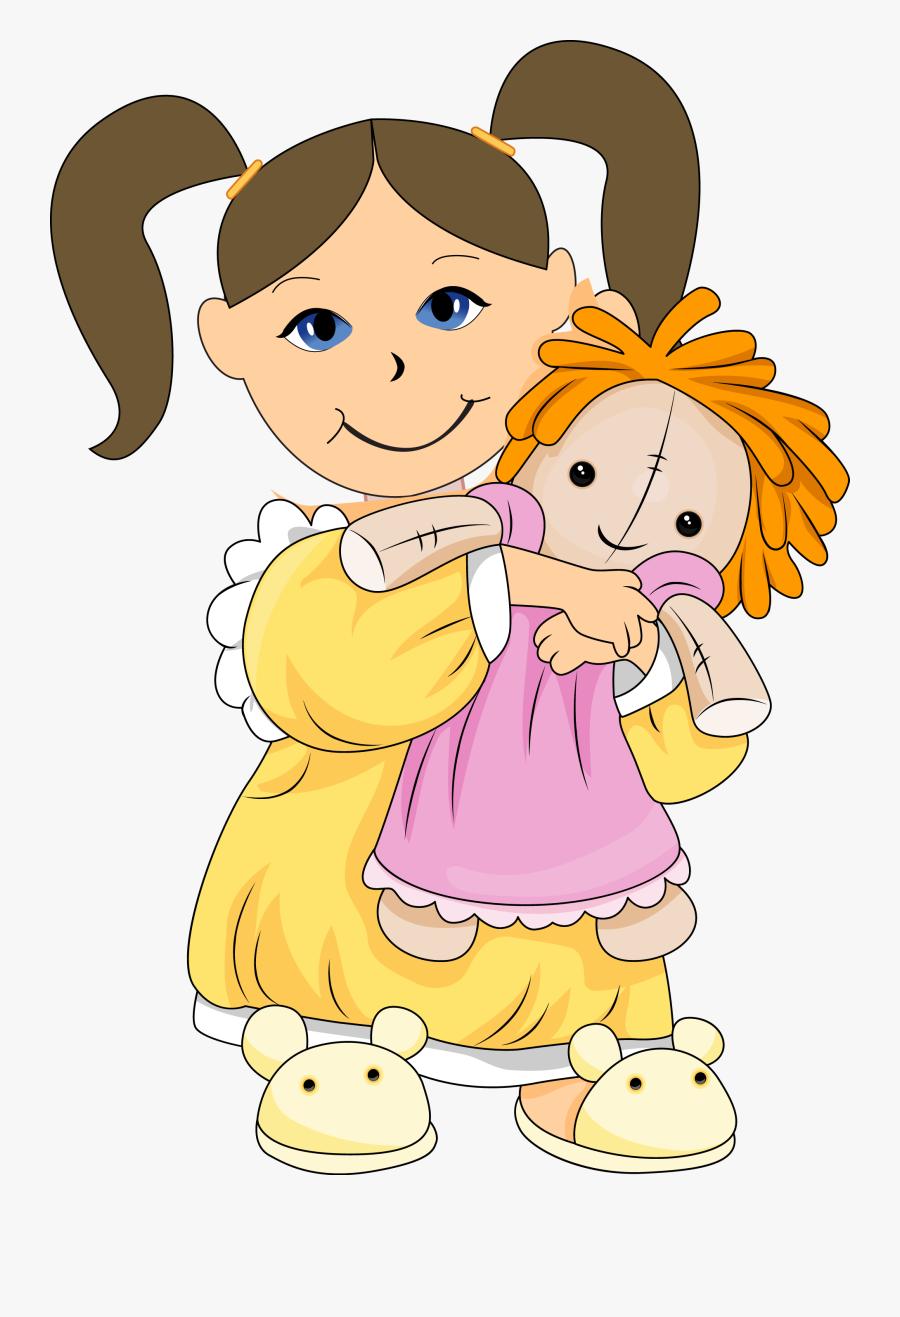 Barbie Doll Cartoon Clipart - Girl Holding Doll Clipart, Transparent Clipart